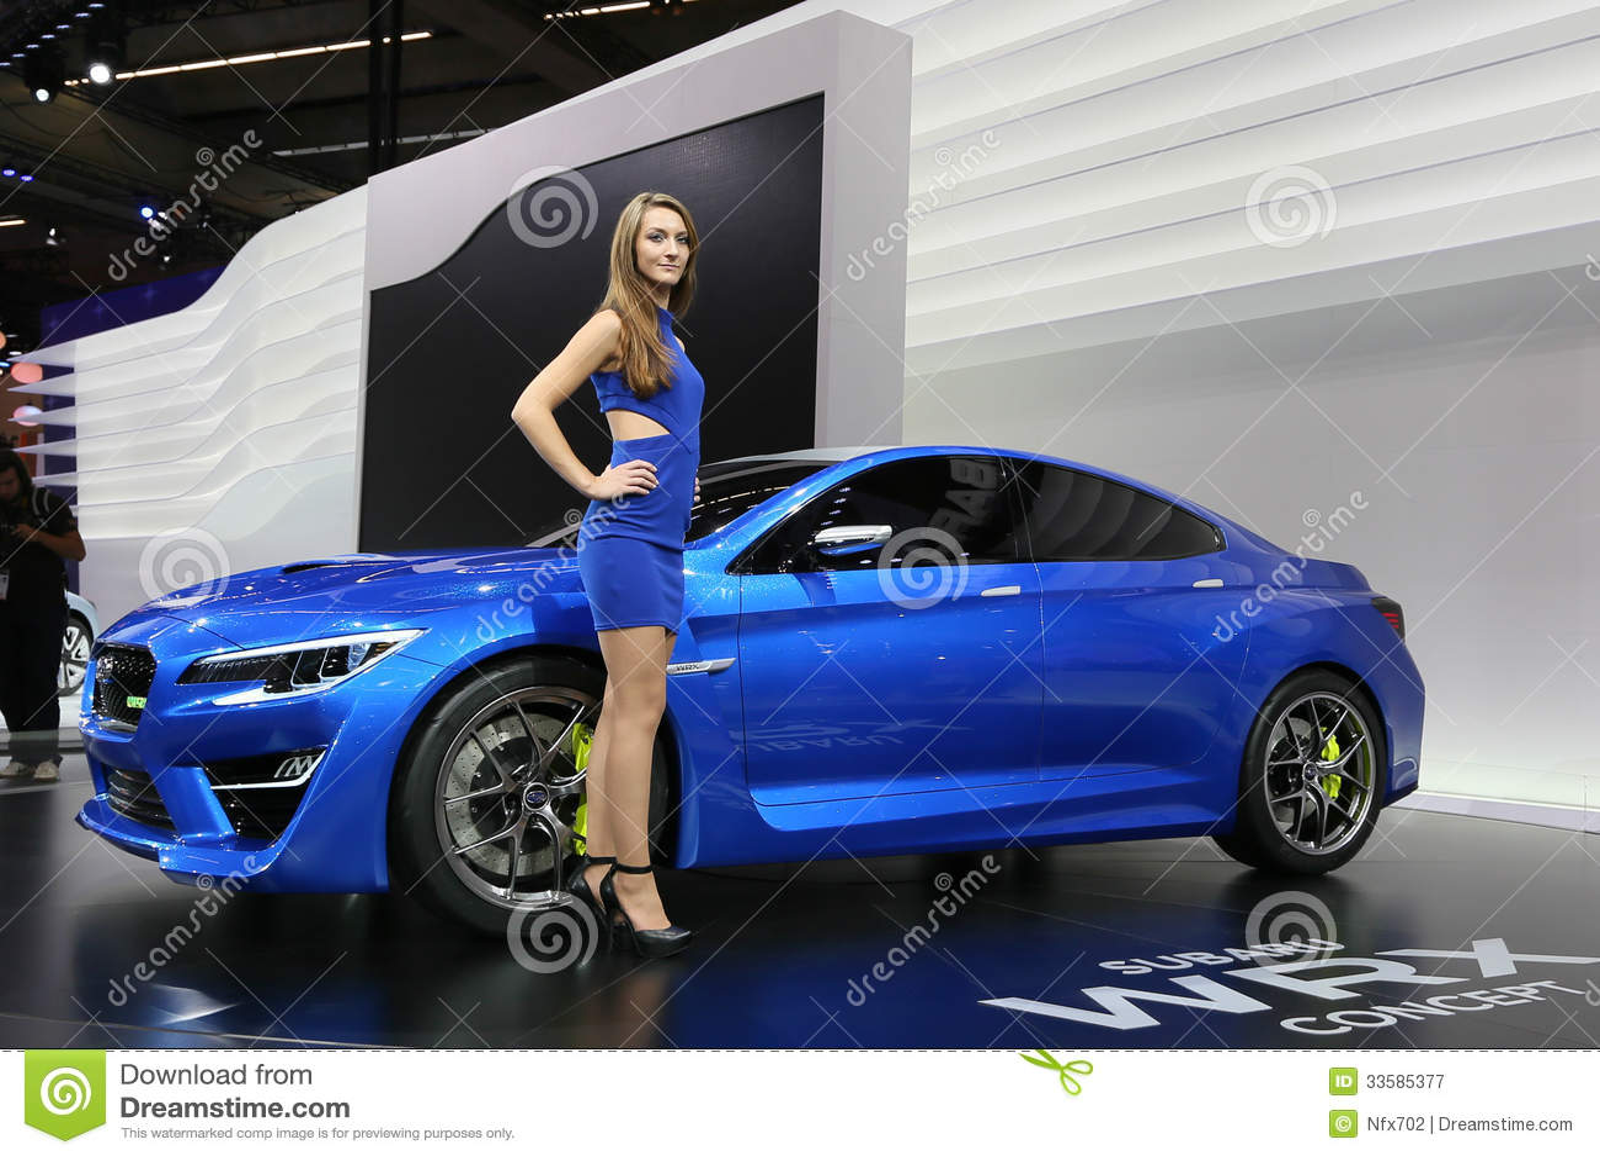 Srt Dodge Dart >> Subaru Wrx Sti Concept   2017 - 2018 Best Cars Reviews